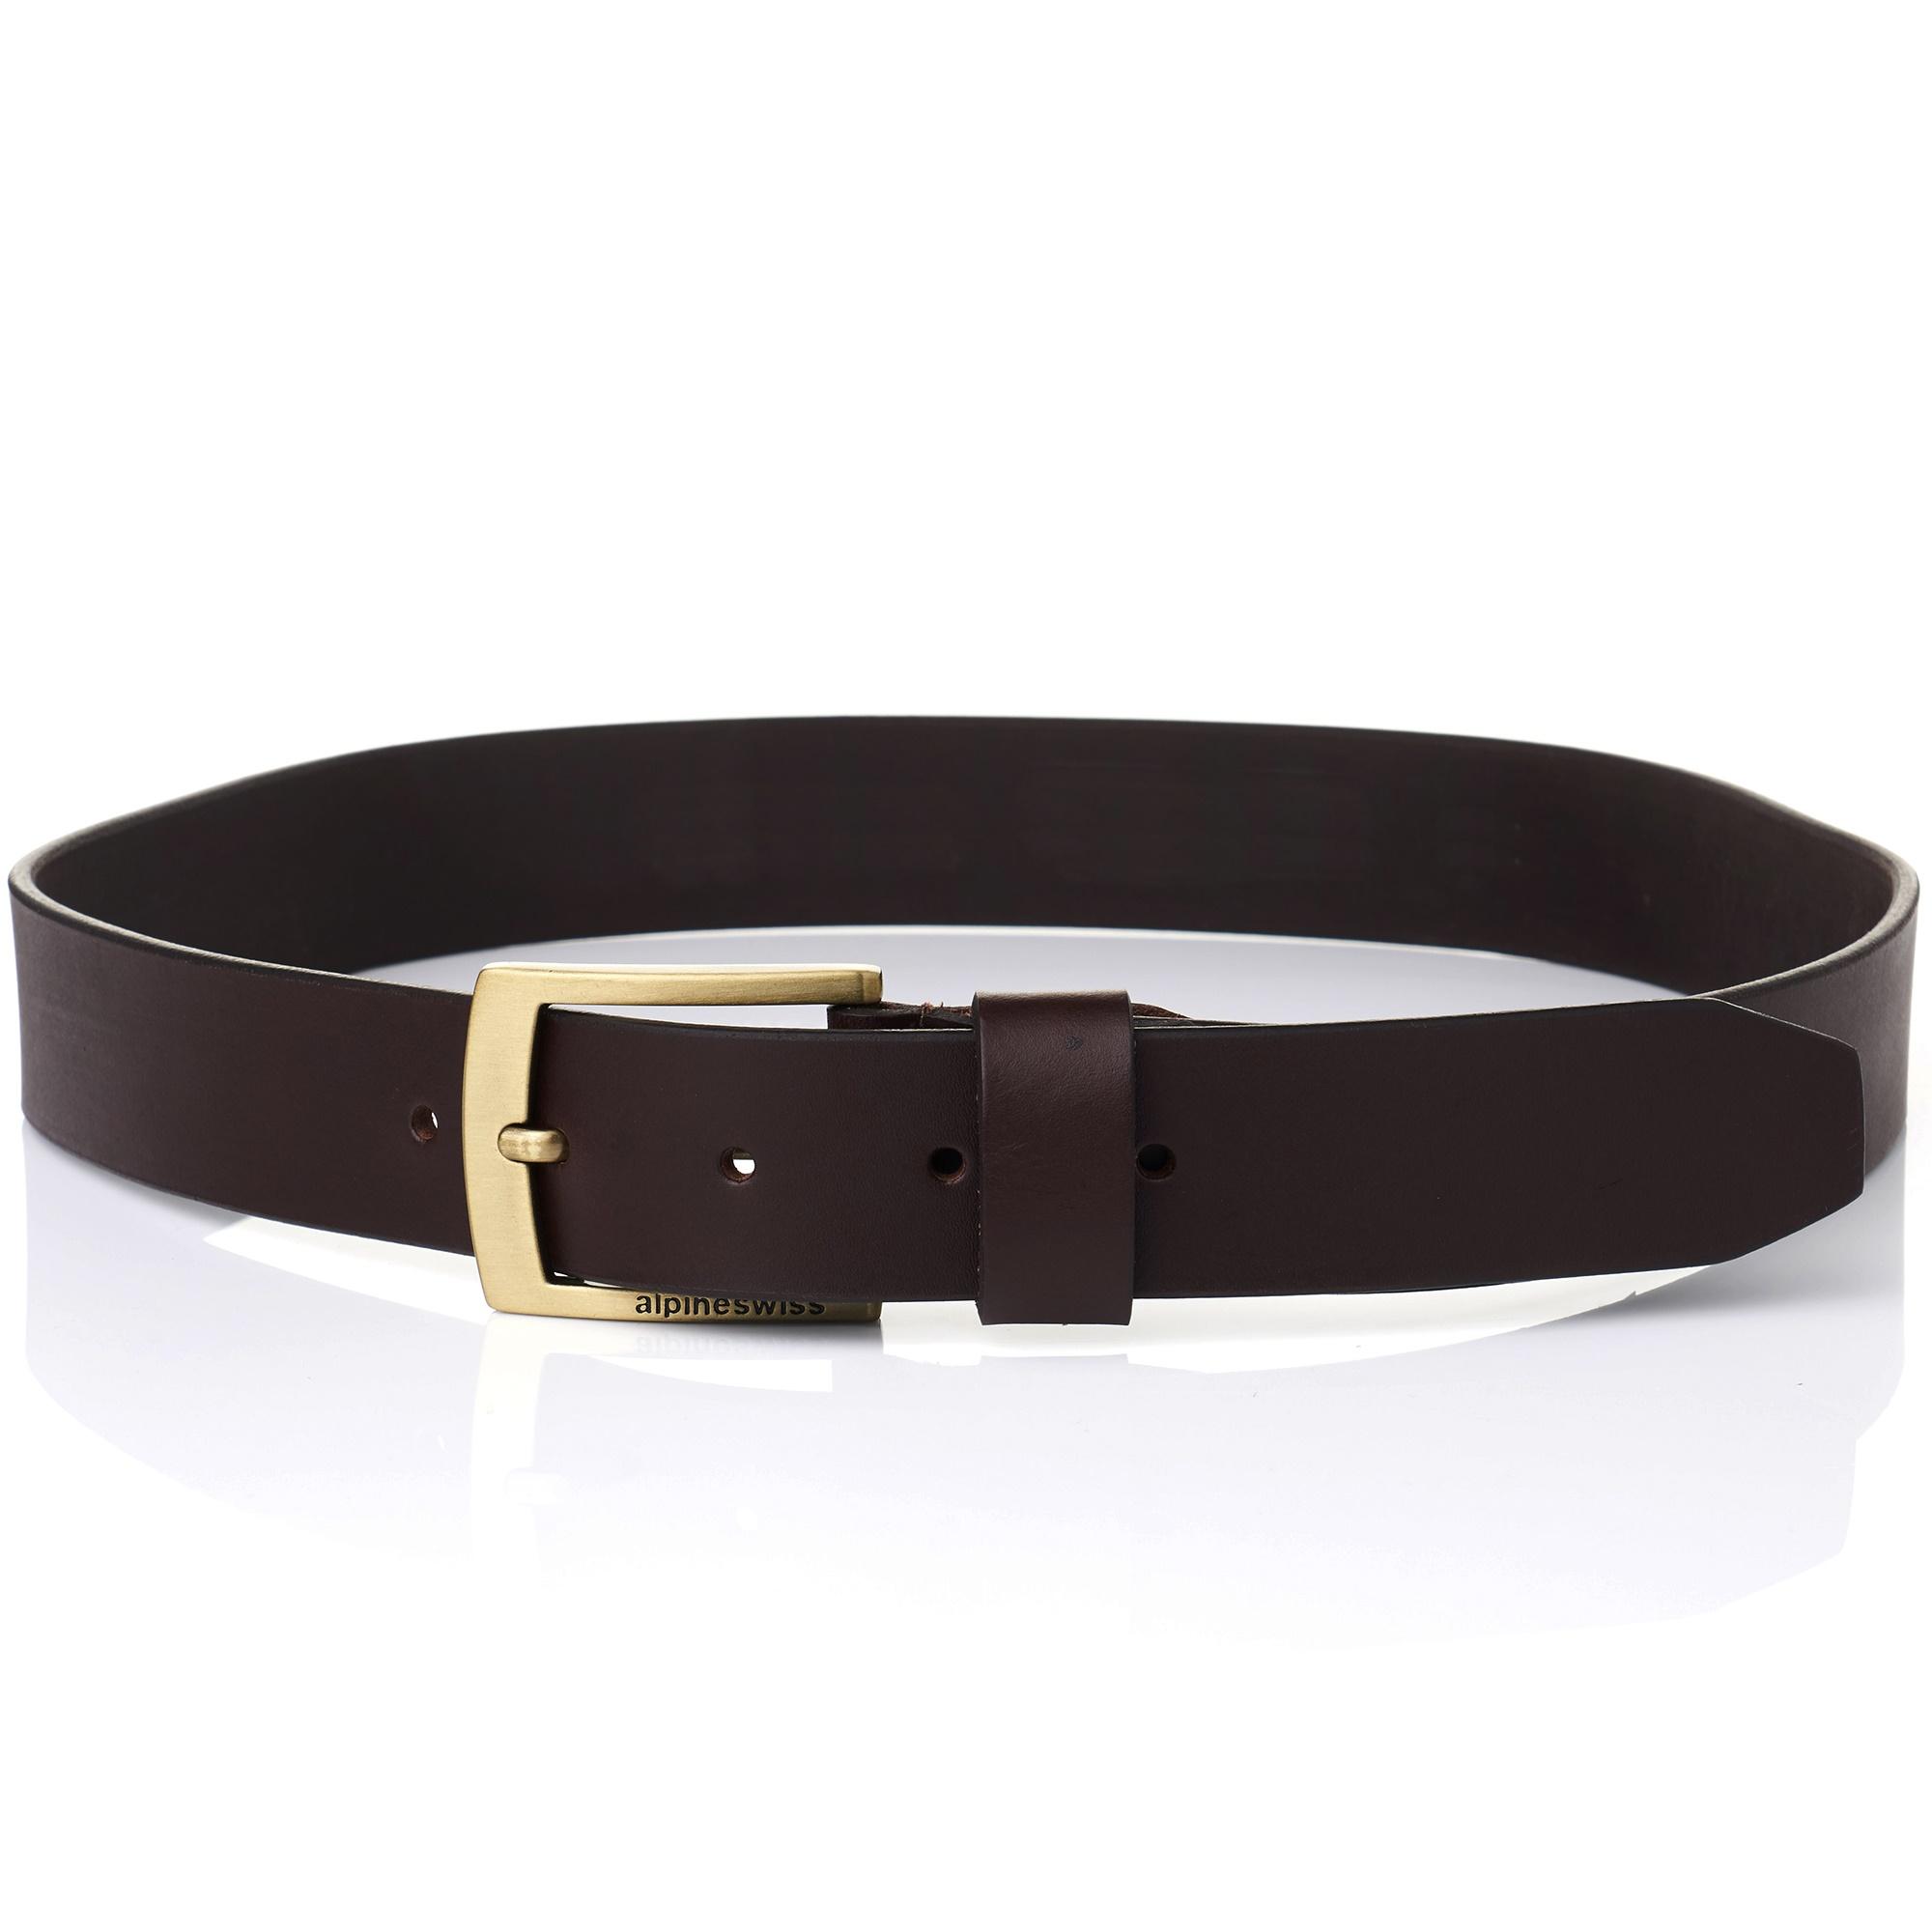 Alpine-Swiss-Mens-Leather-Belt-Slim-1-1-4-Casual-Jean-Dakota-Signature-Buckle thumbnail 16